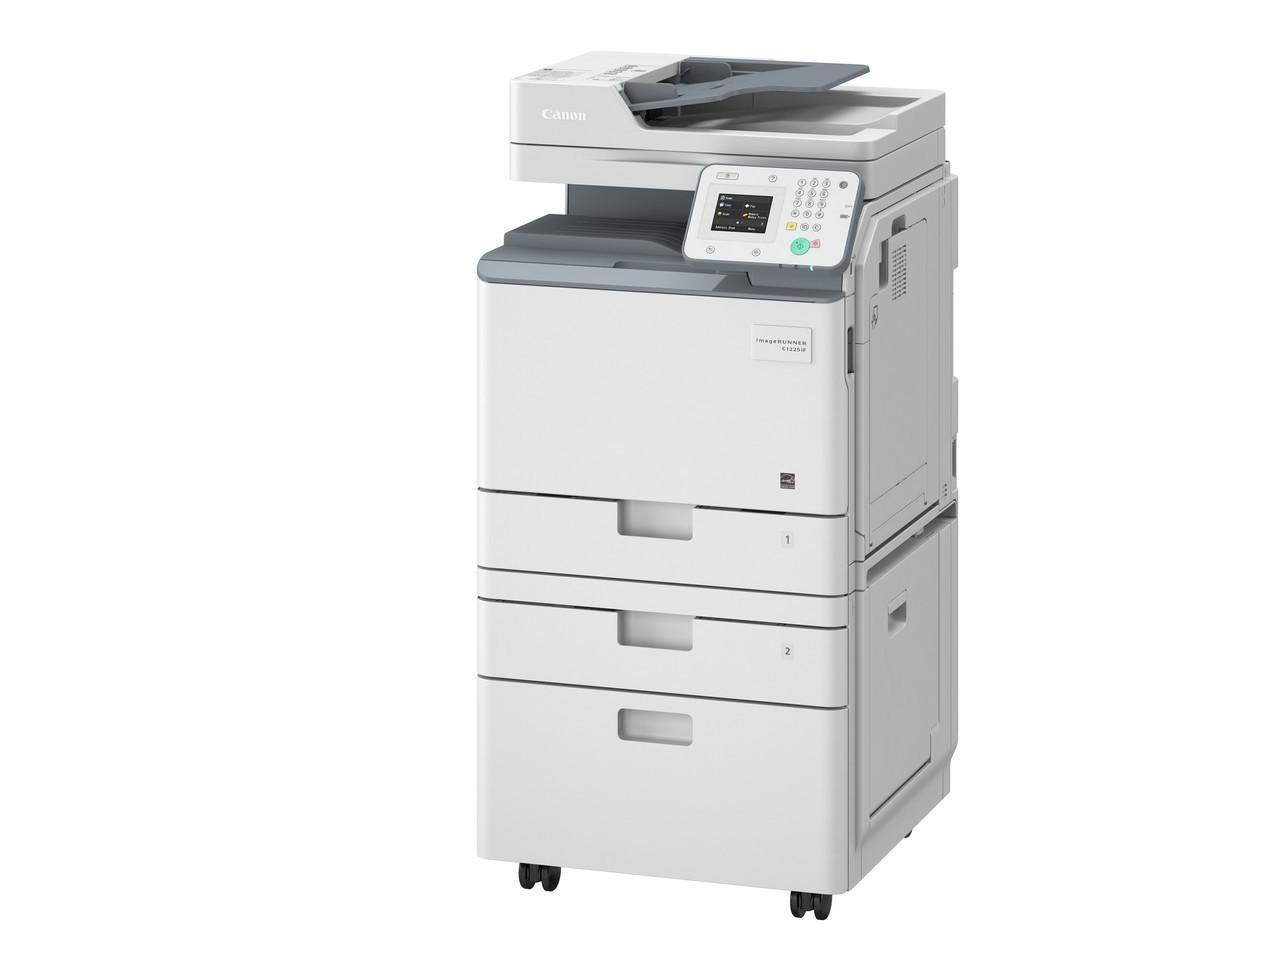 Canon imageRUNNER C1325iF (принтер/копир/сканер/факс)